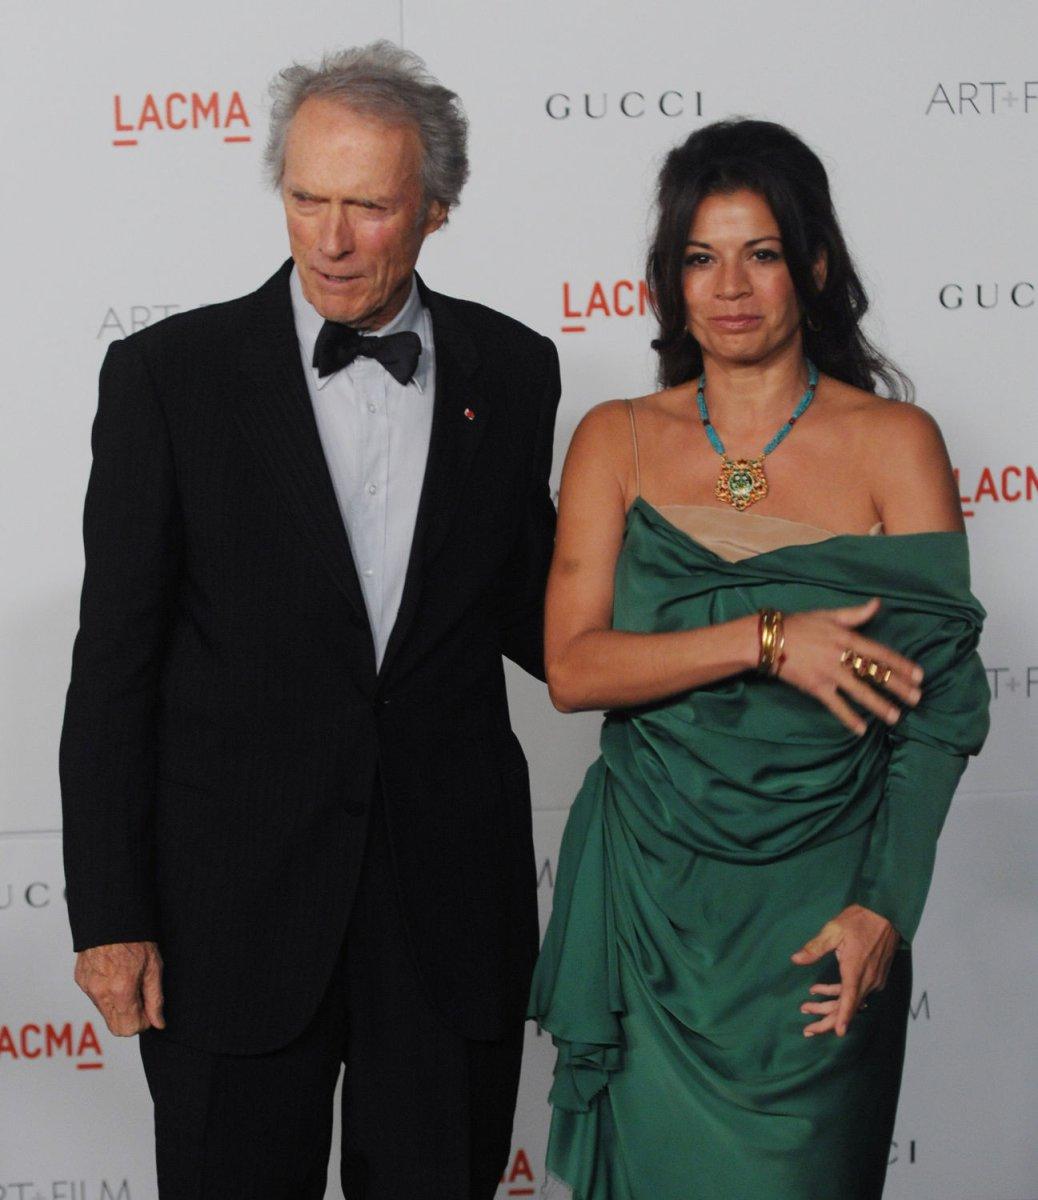 Clint Eastwood's Wife, Dina, Returns To TV News